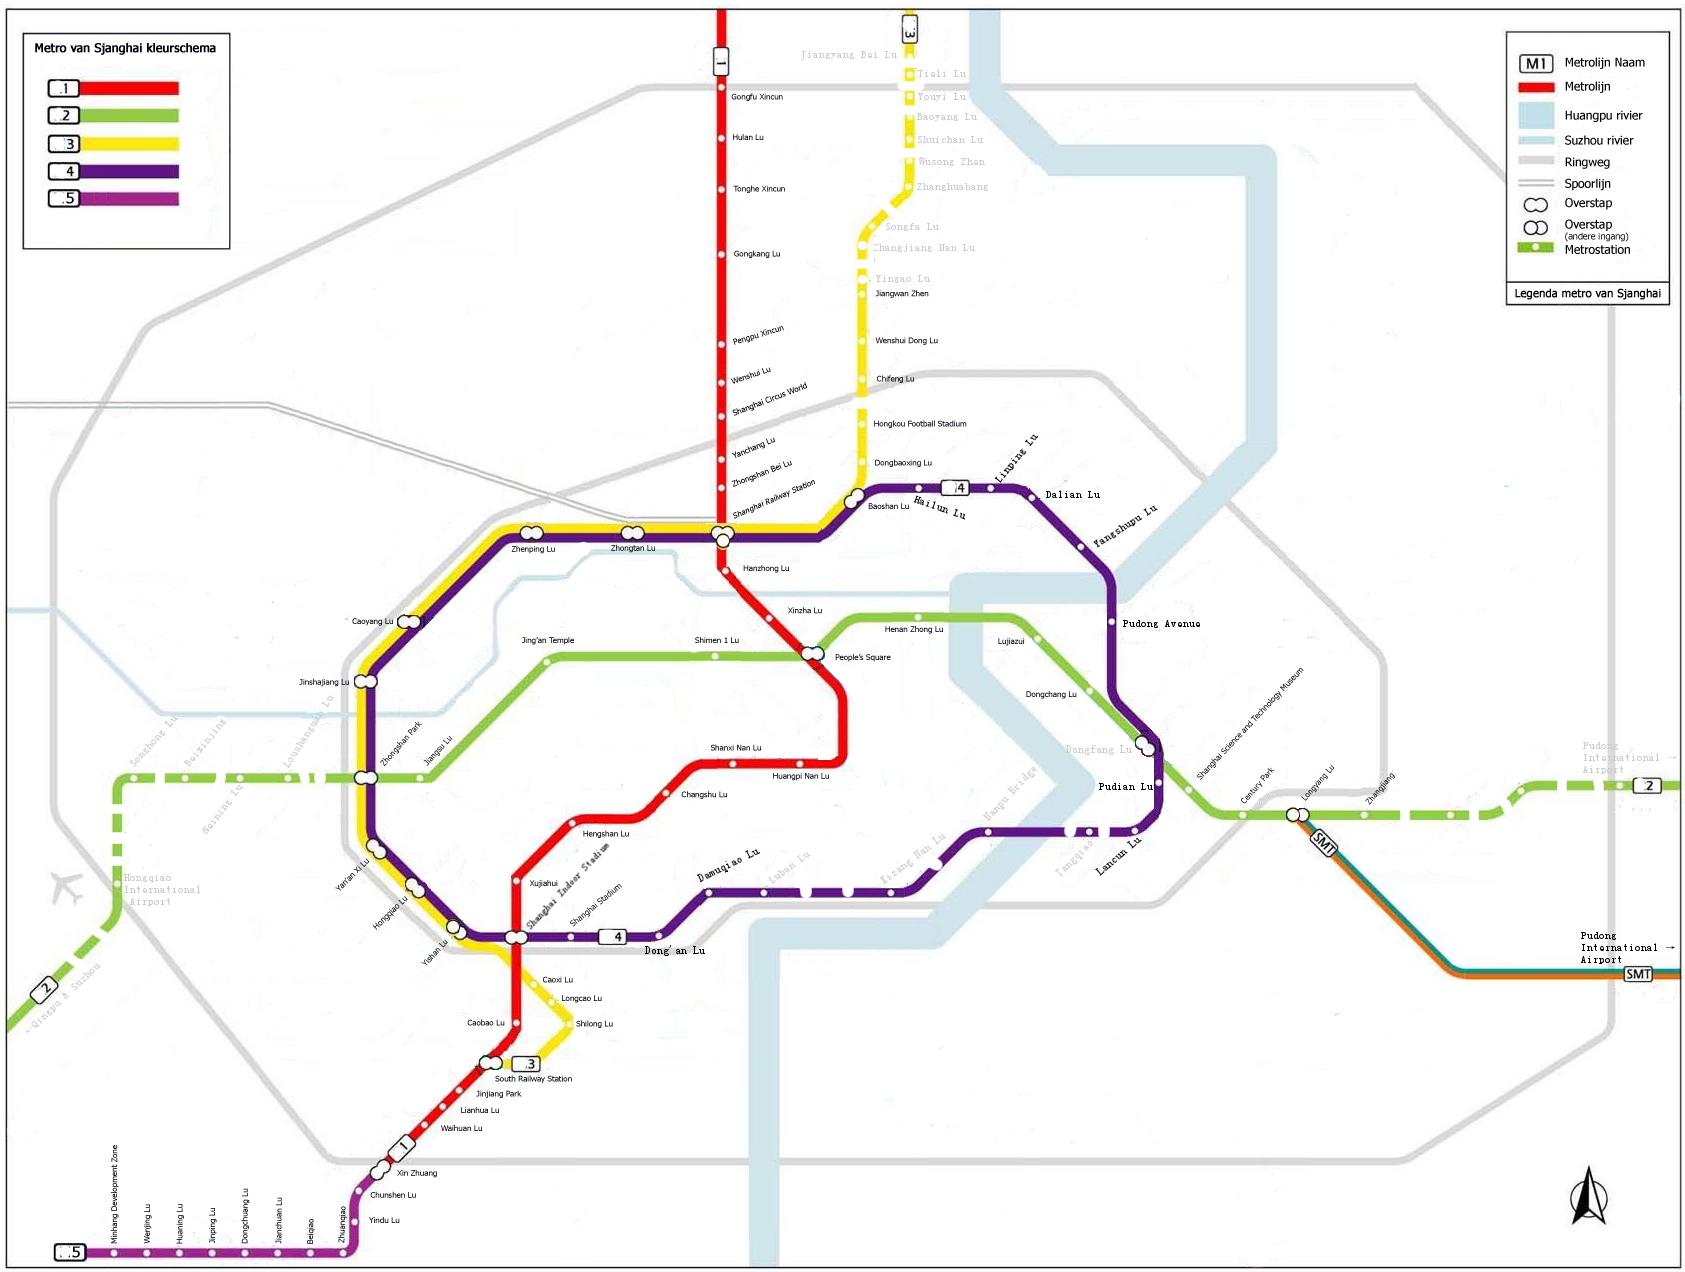 File:Shanghai metro 2006 nl.png - Wikimedia Commons on map of montreal metro, map of hamburg metro, map of prague metro, map of panama city metro, map of metro rail, map of washington metro, map of zhengzhou metro, map of london metro, map of dubai metro, map of moscow metro, map of barcelona metro, map of houston metro, map of suzhou metro, map of chicago metro, map of rome metro, map of nanjing metro, map of dublin metro, map of shenzhen metro, map of copenhagen metro, map of brussels metro,